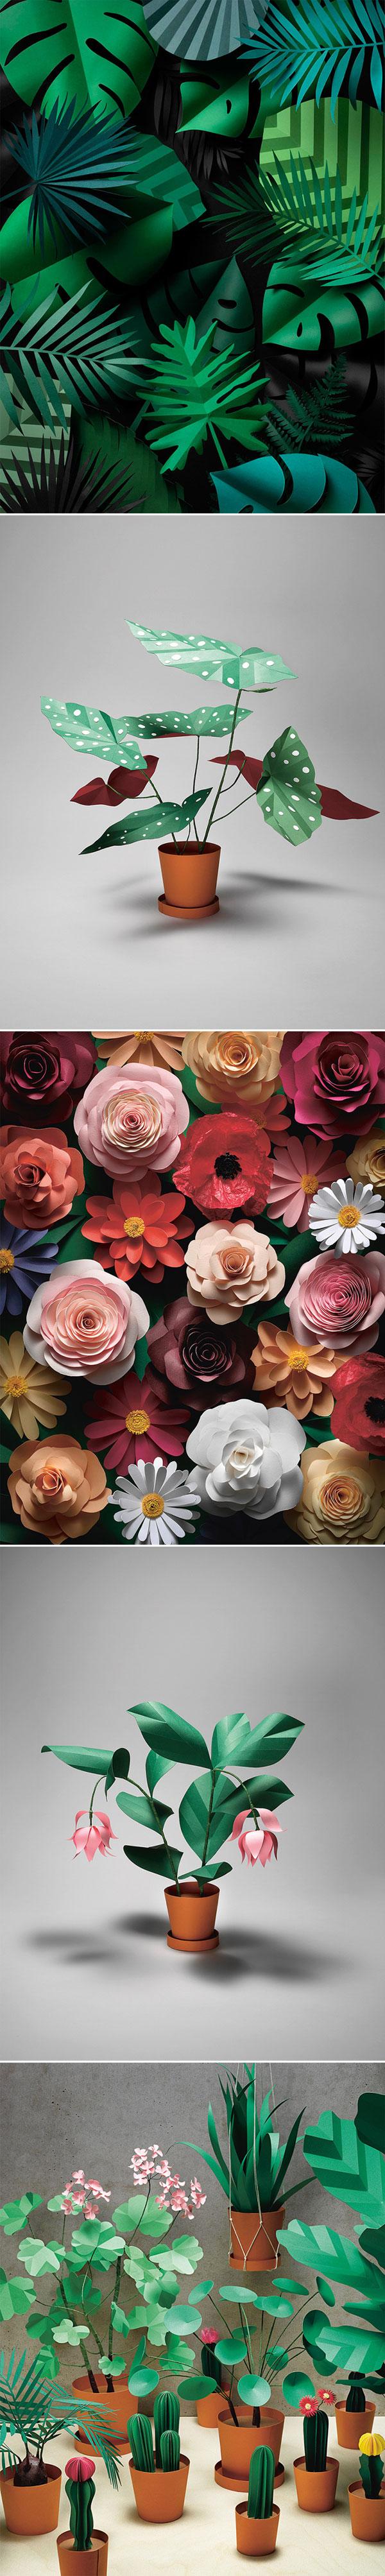 Fideli Sundqvist - Paper Garden | Arte com Papel